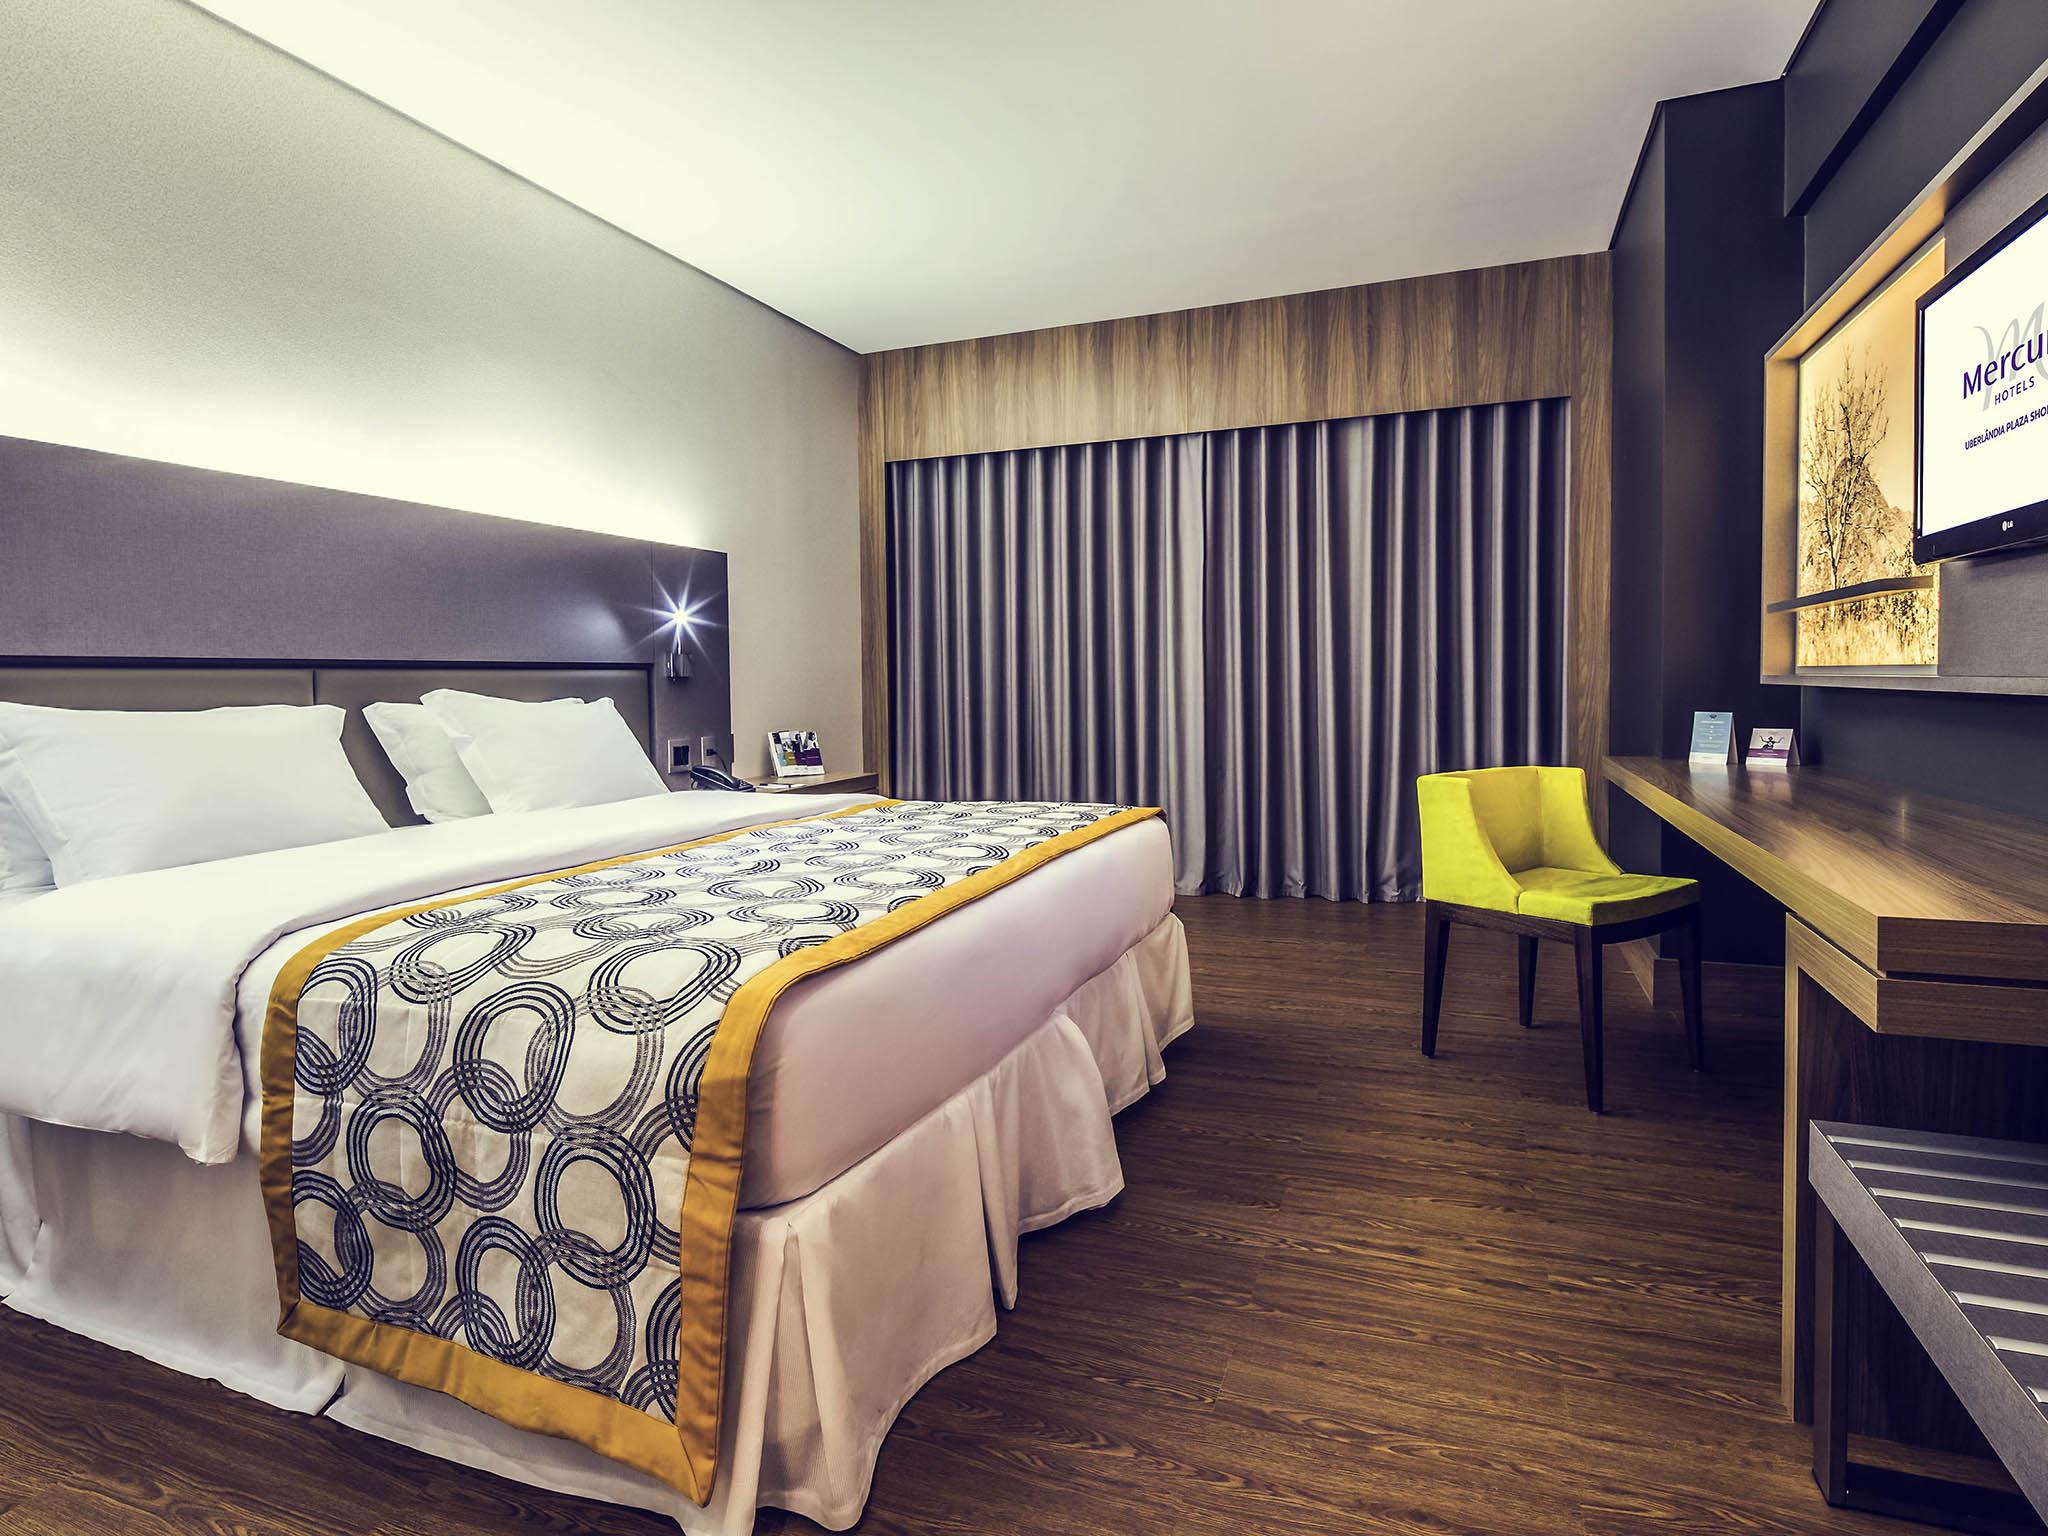 mercure uberlandia plaza shopping hotel book online